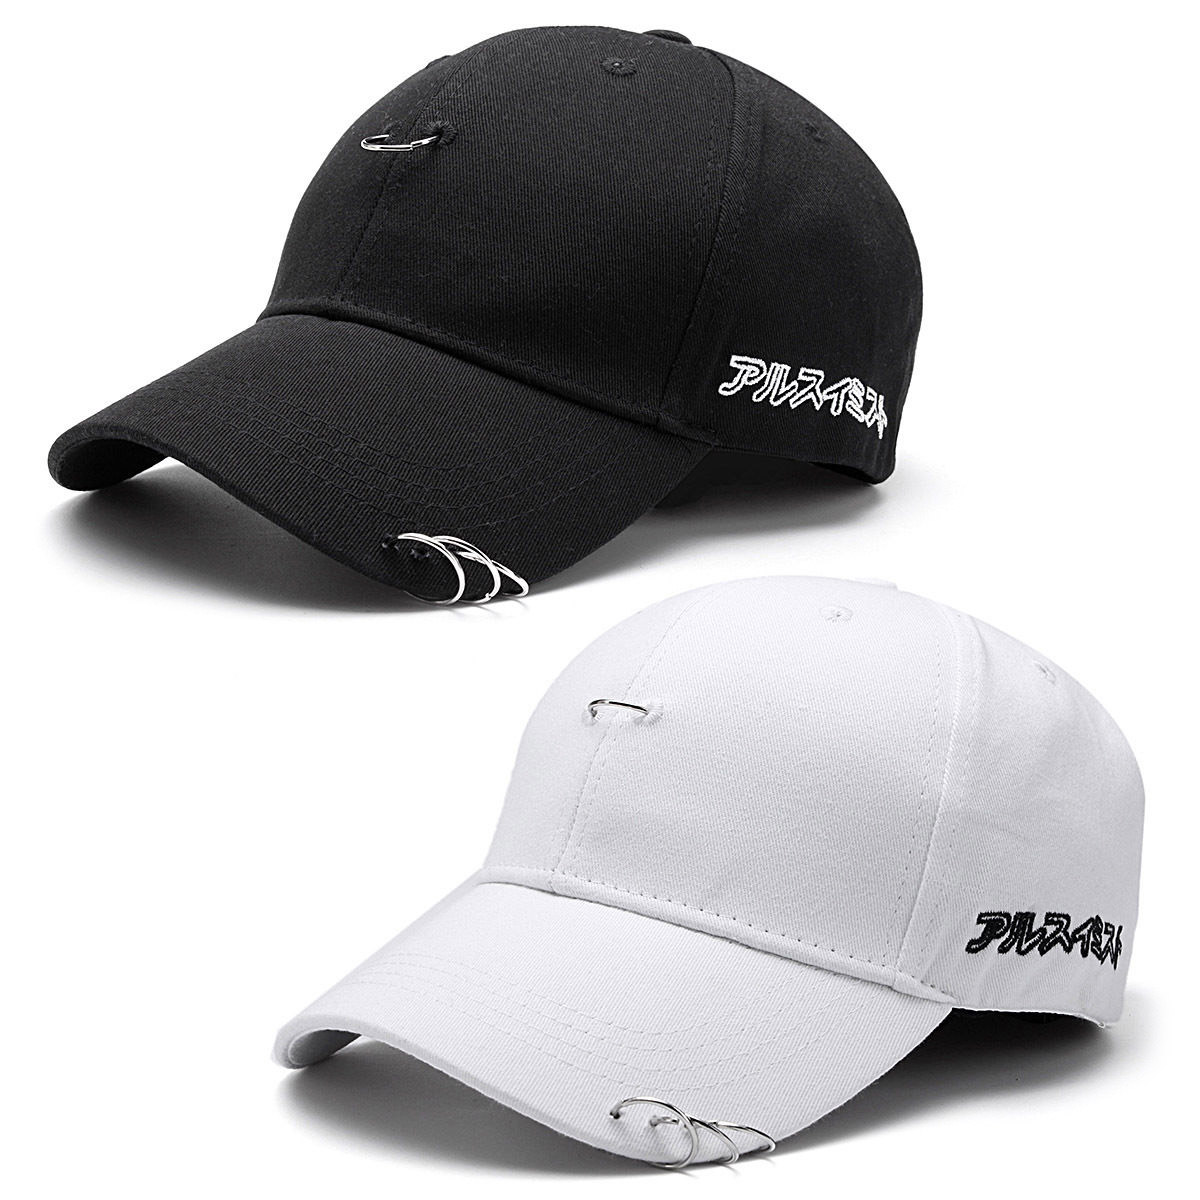 45b6c119782 Fashion Unisex Solid Hats Ring Hip Hop Curved Strapback Baseball Cap Men  Women Snapback Caps Baseball Hat Casquette Gorras